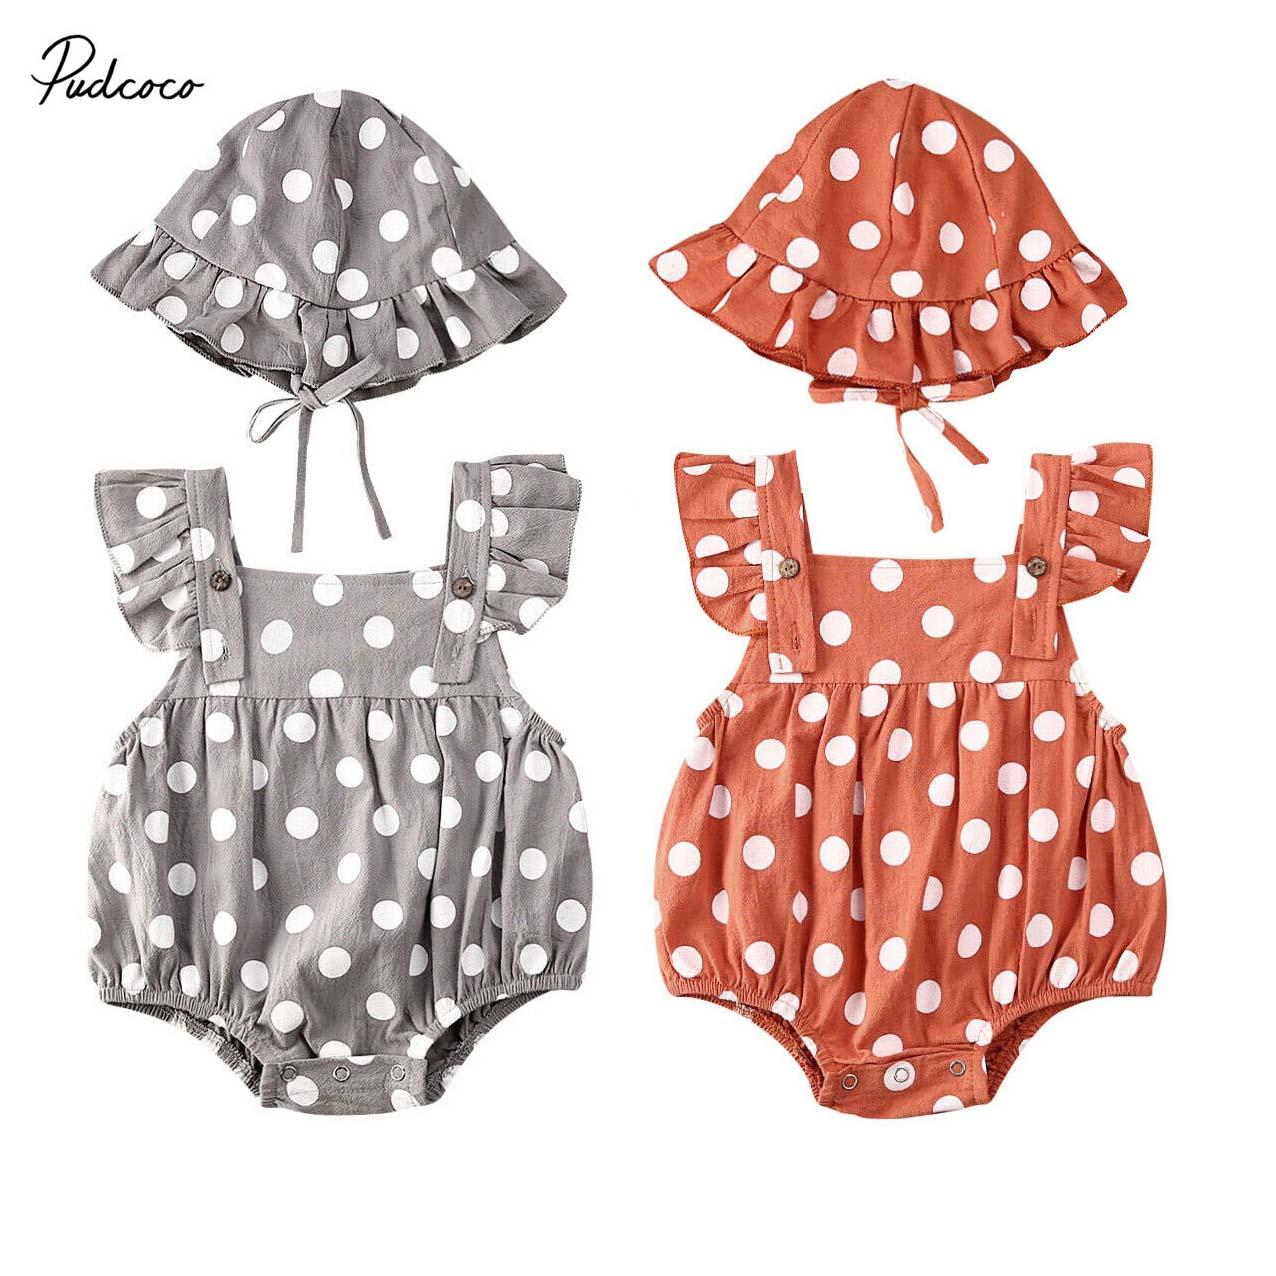 2020 lindo bebé recién nacido niños niña Bodysuit + Hat 2 uds Dot Ruffle manga larga Sunsuit Playsuit traje de verano 0-ropa de bebé 24M